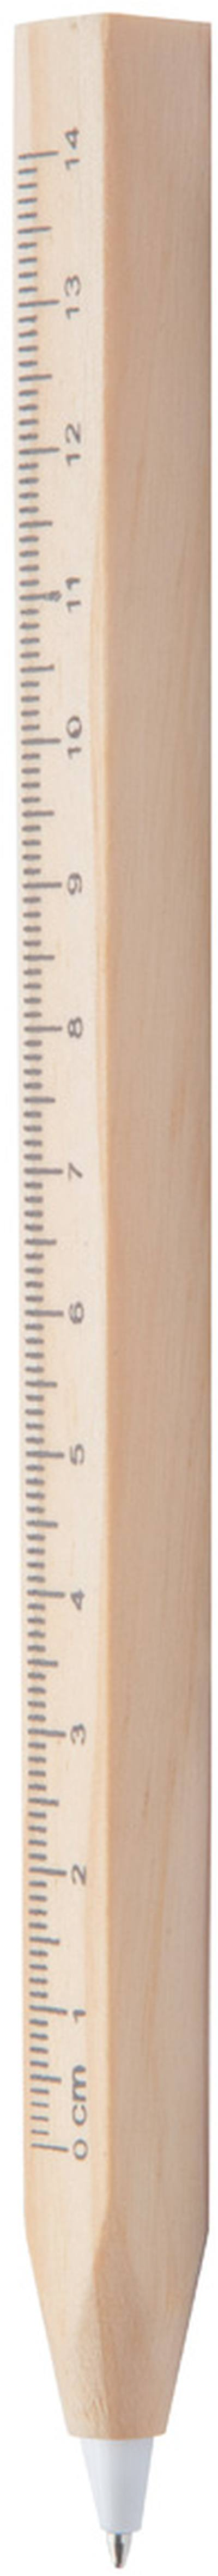 Burnham kuličkové pero s pravítkem